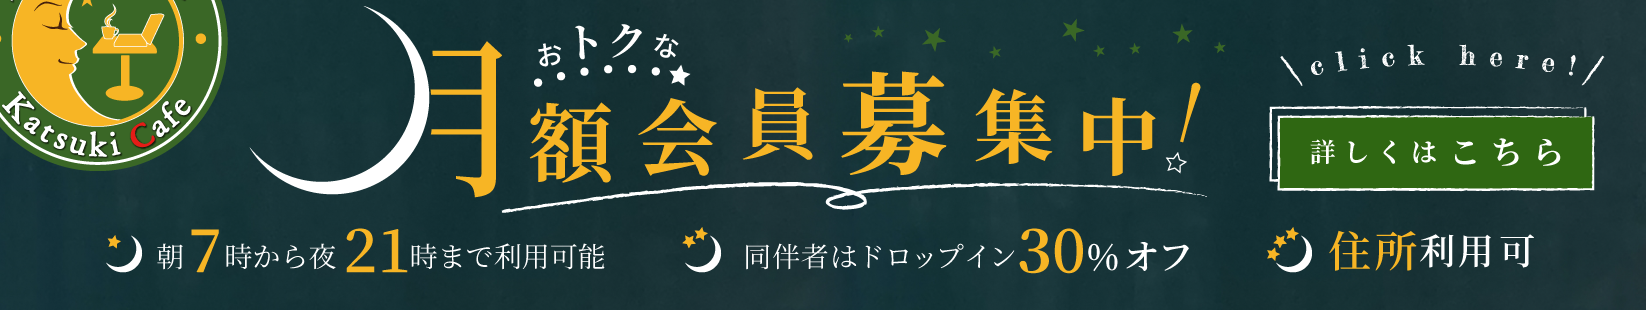 Katsuki Cafe おトクな月額会員募集中!朝7時から夜21時まで利用可能・同伴者はドロップイン30%オフ・住所利用可。詳しくはこちら